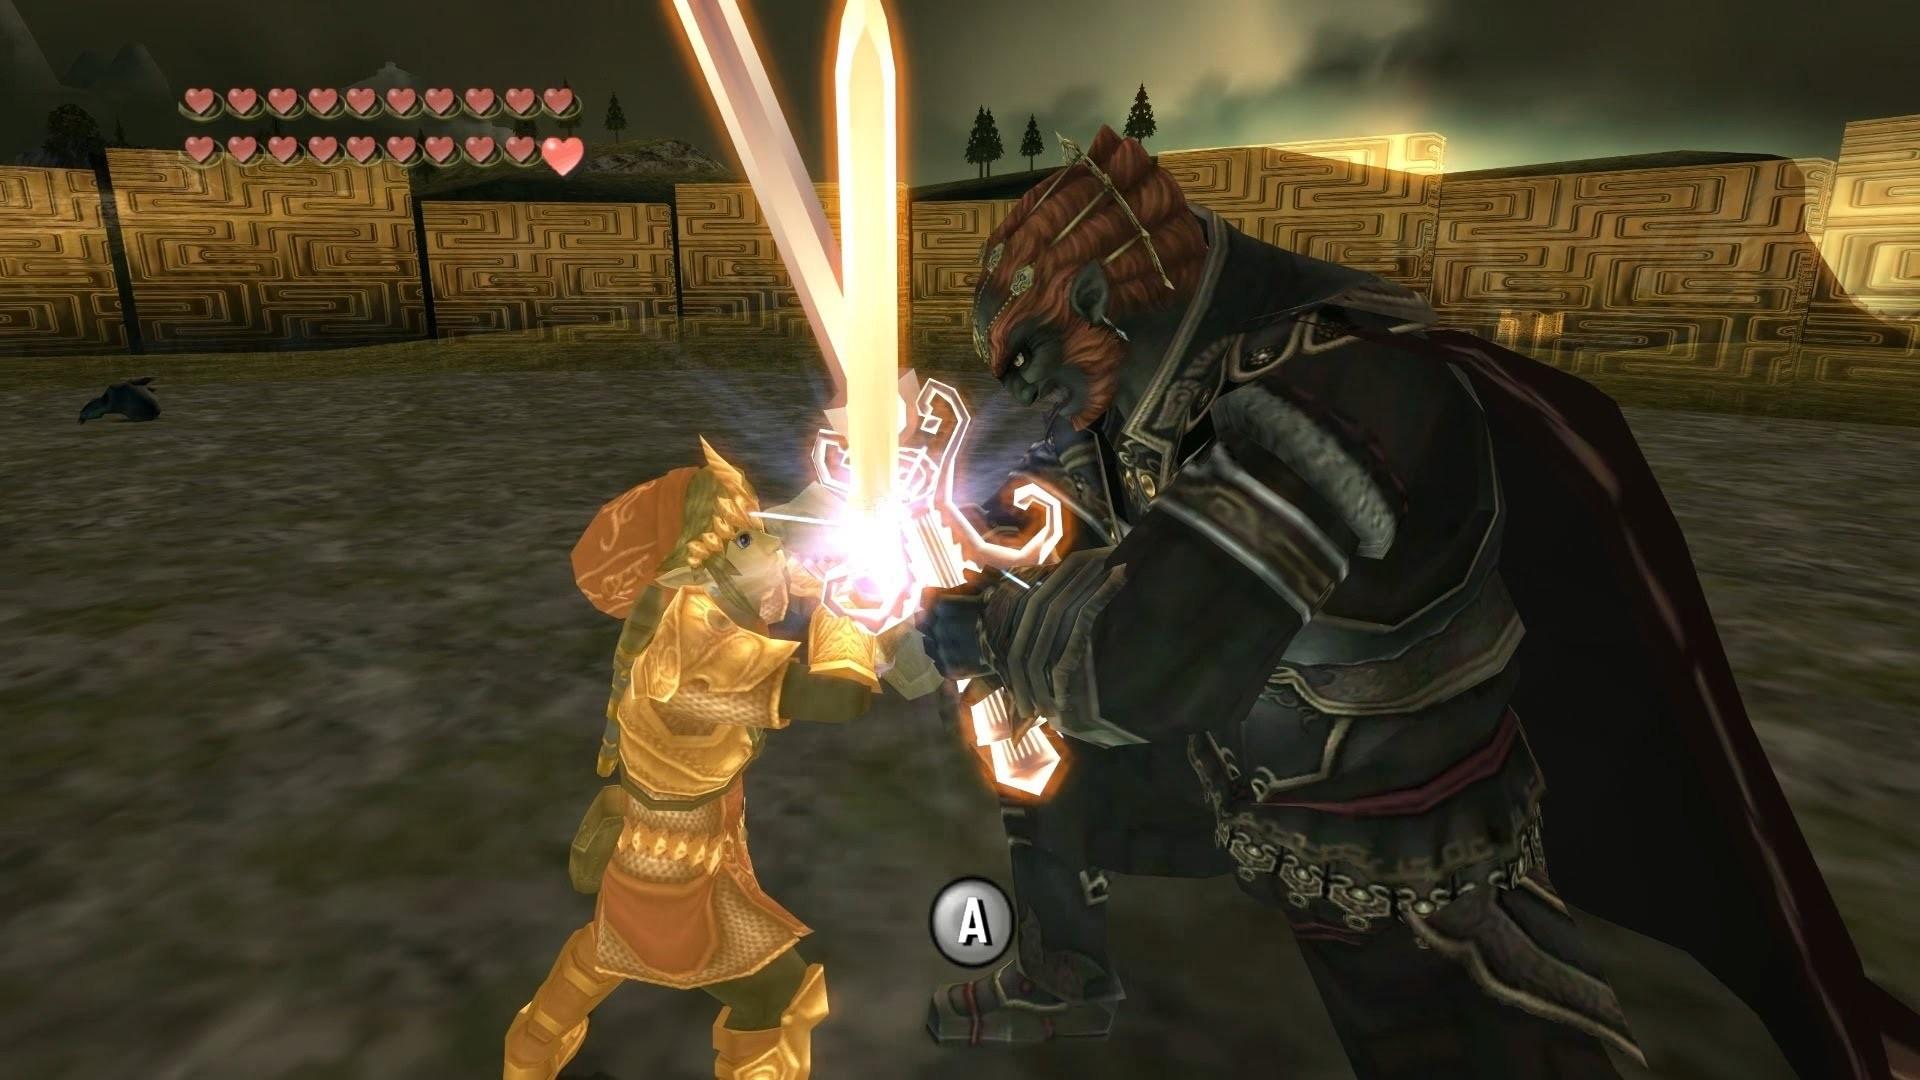 [HD] Zelda Twilight Princess Final Boss – Ganondorf Duel (Magic Armor) –  YouTube